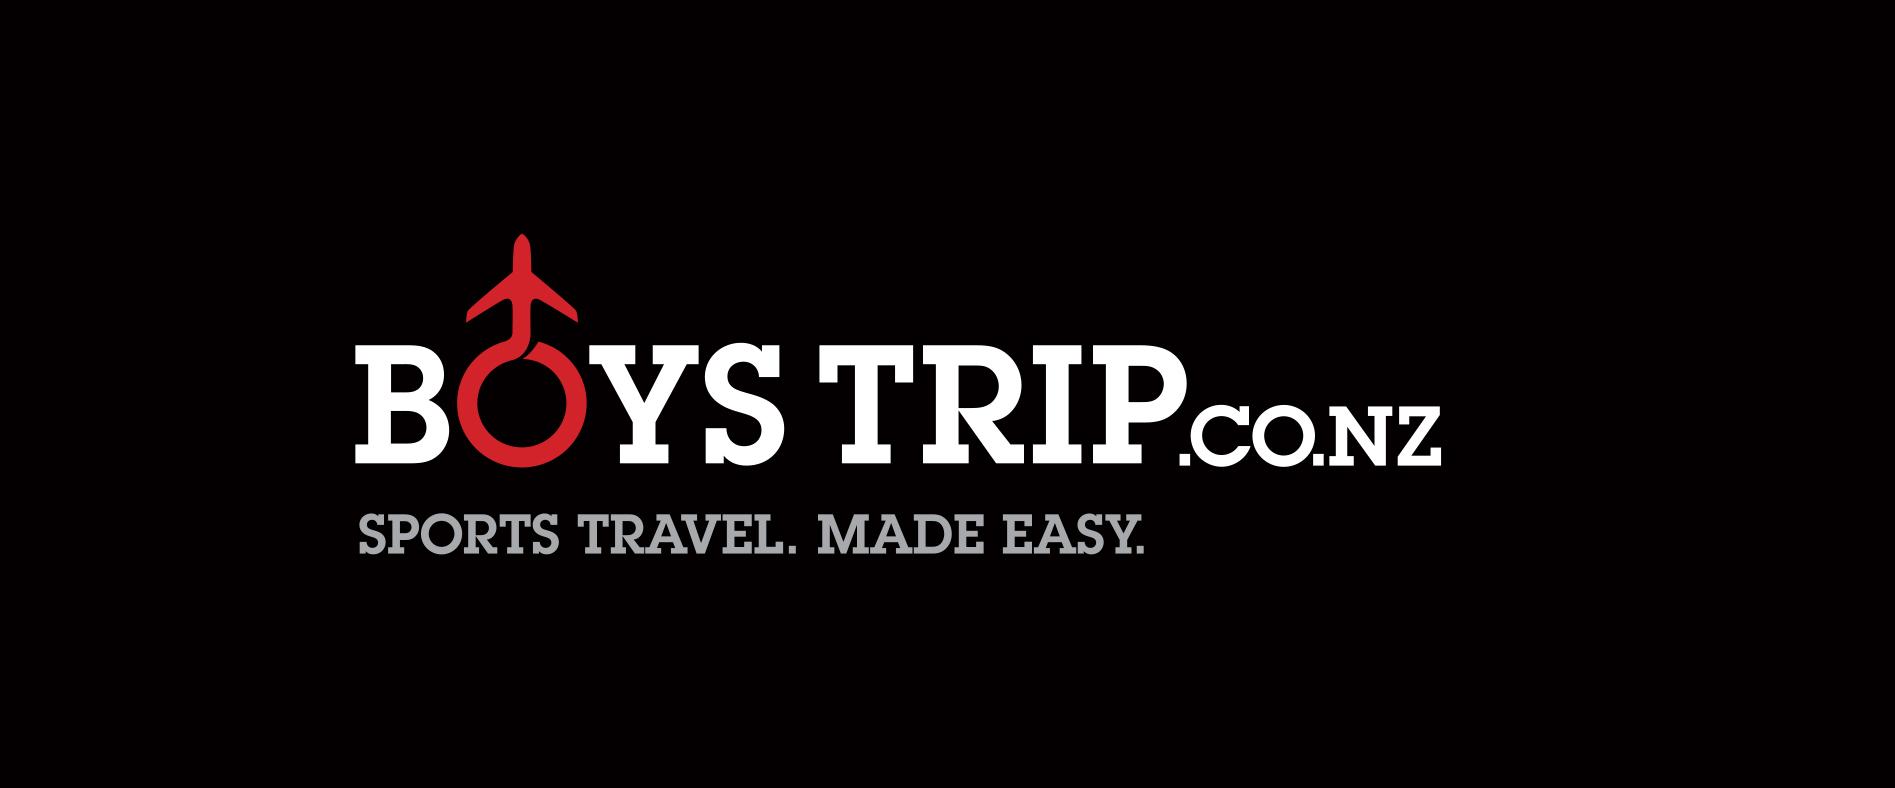 Boys Trip.co.nz Sports Travel Logo (Black).jpg